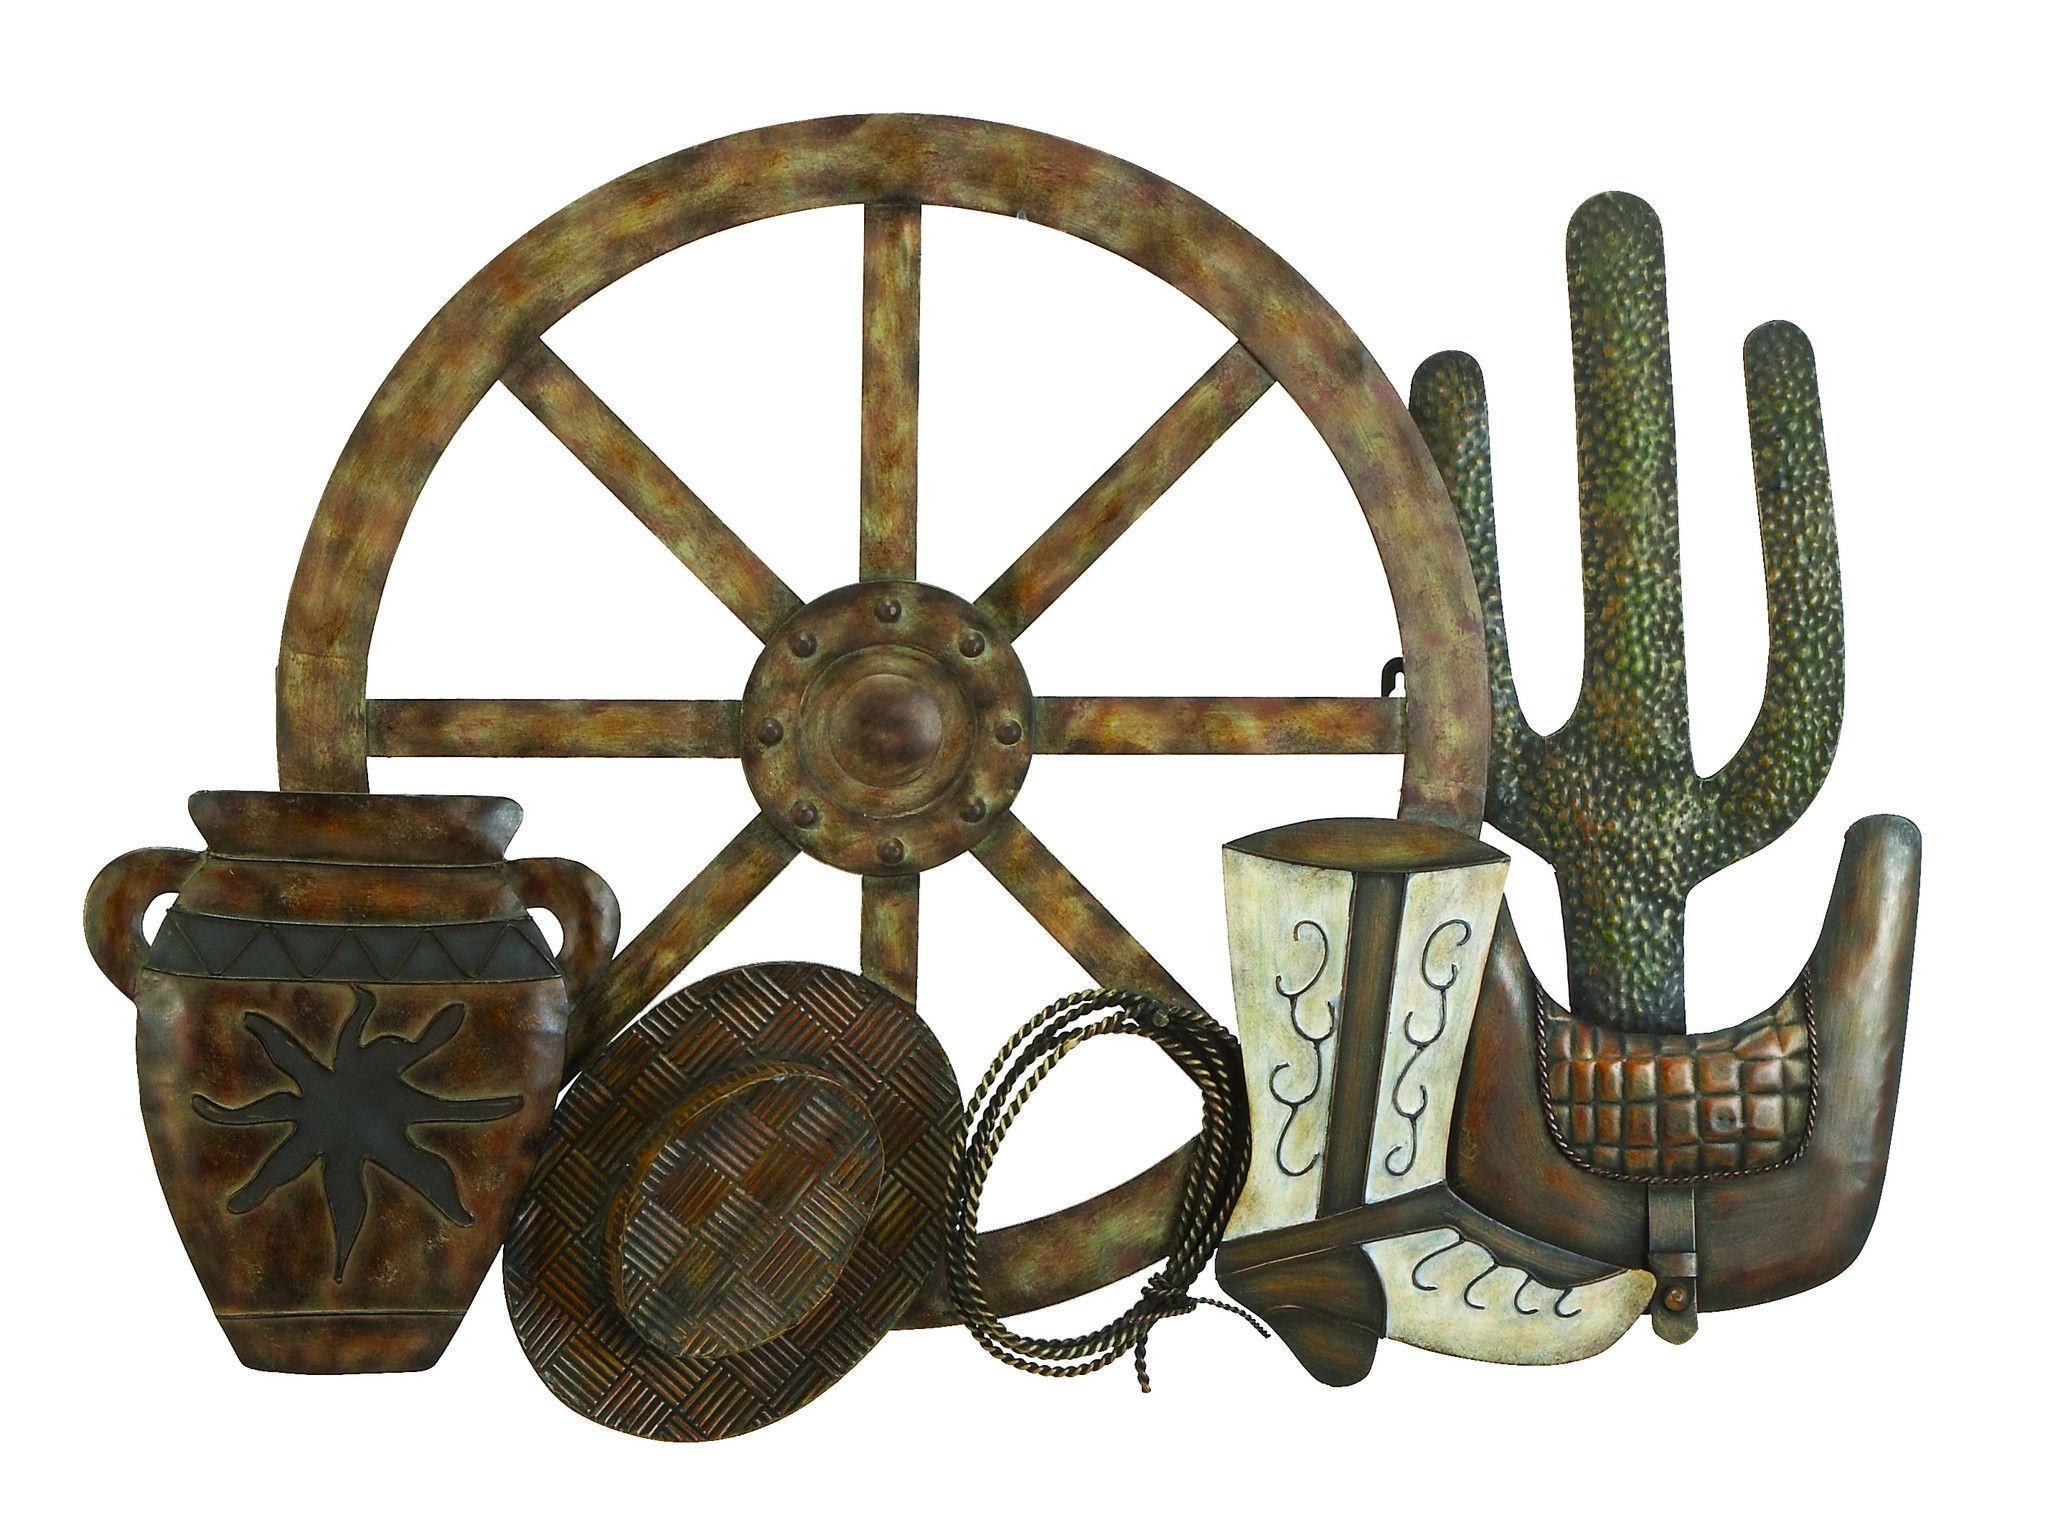 Wooden Wagon Wheel Wall Decor from visualhunt.com